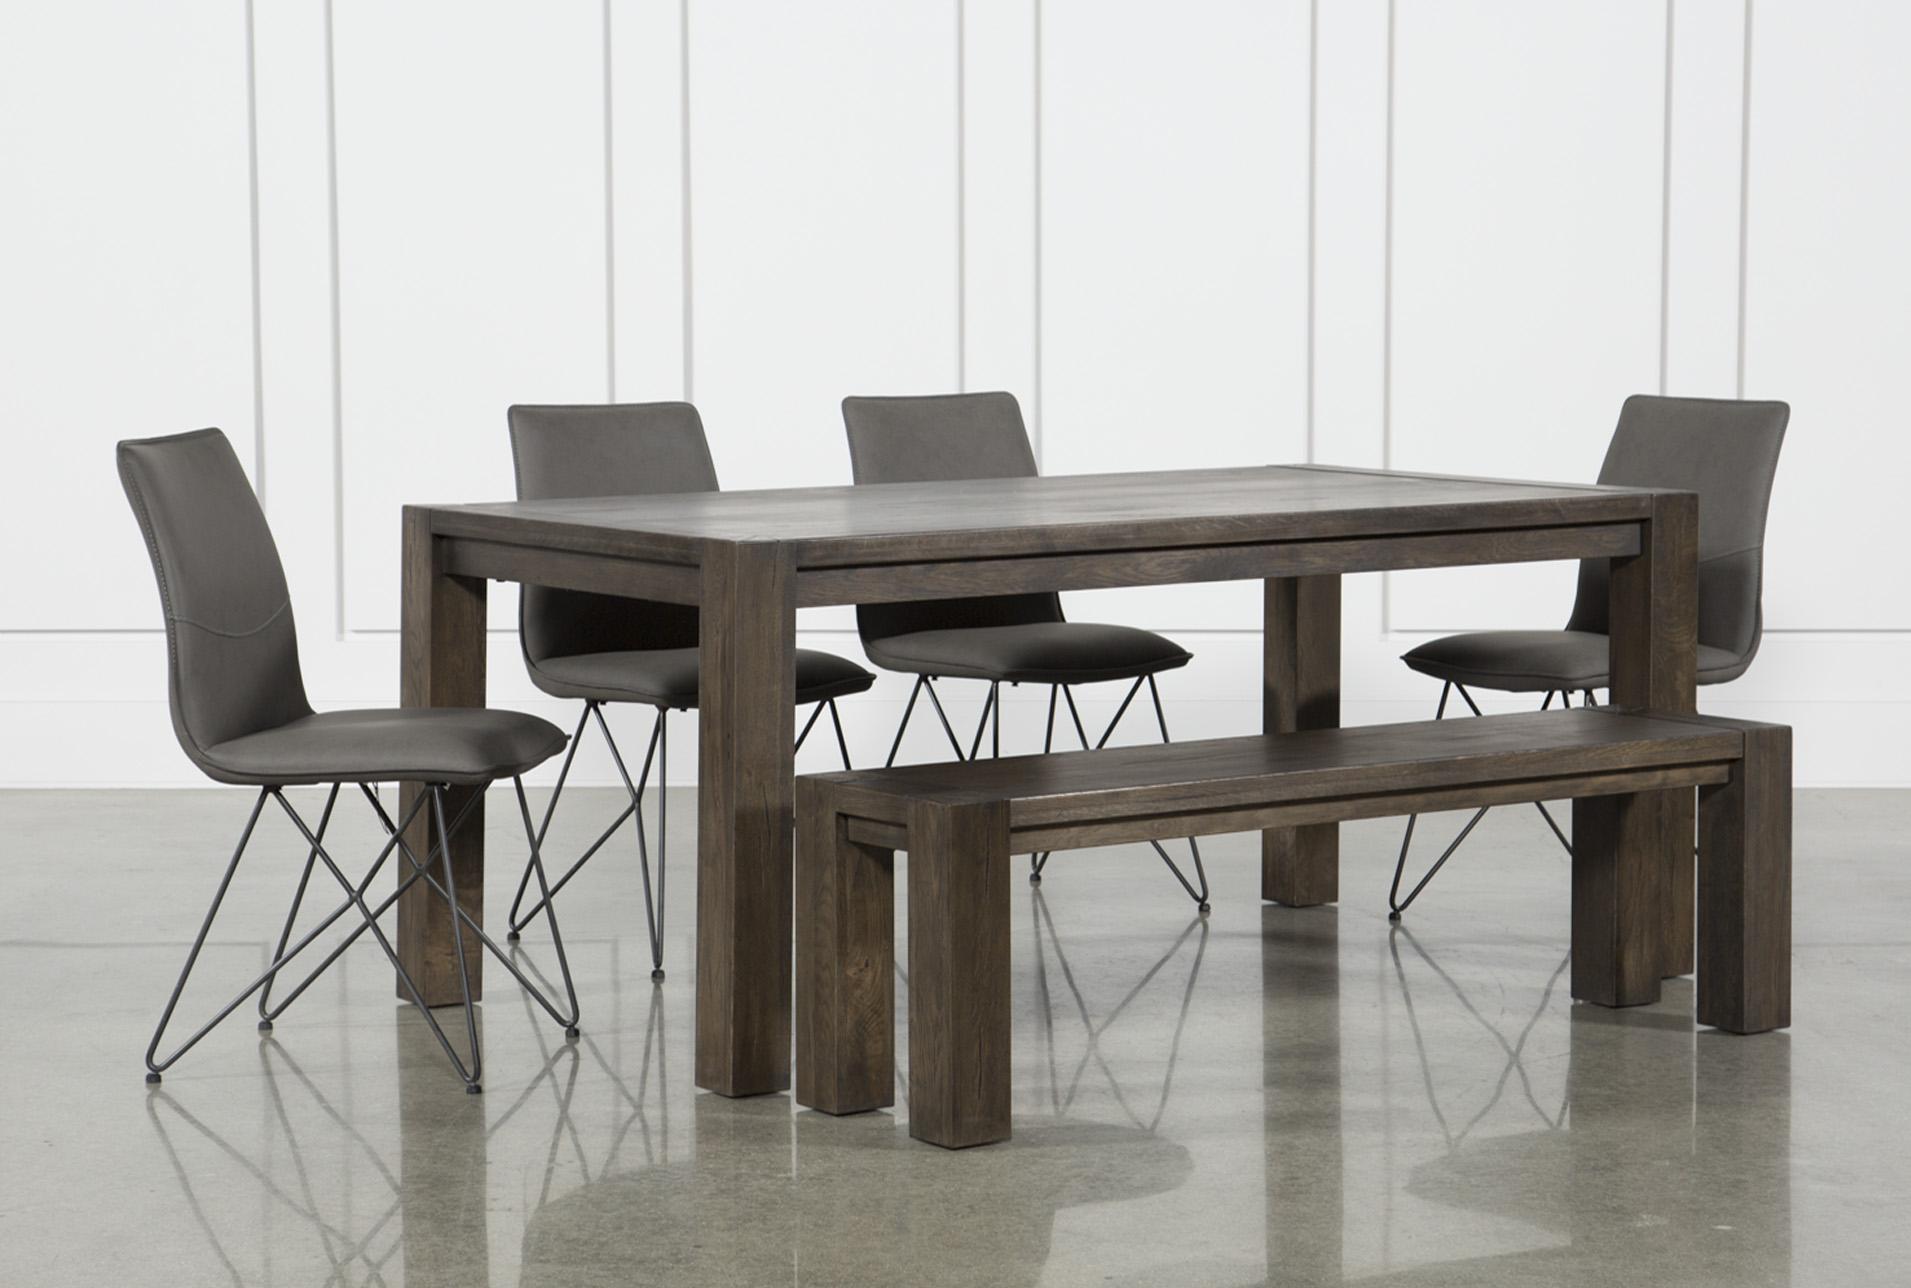 Benson 6 Piece Extension Dining Set W/Ranger Chairs   360